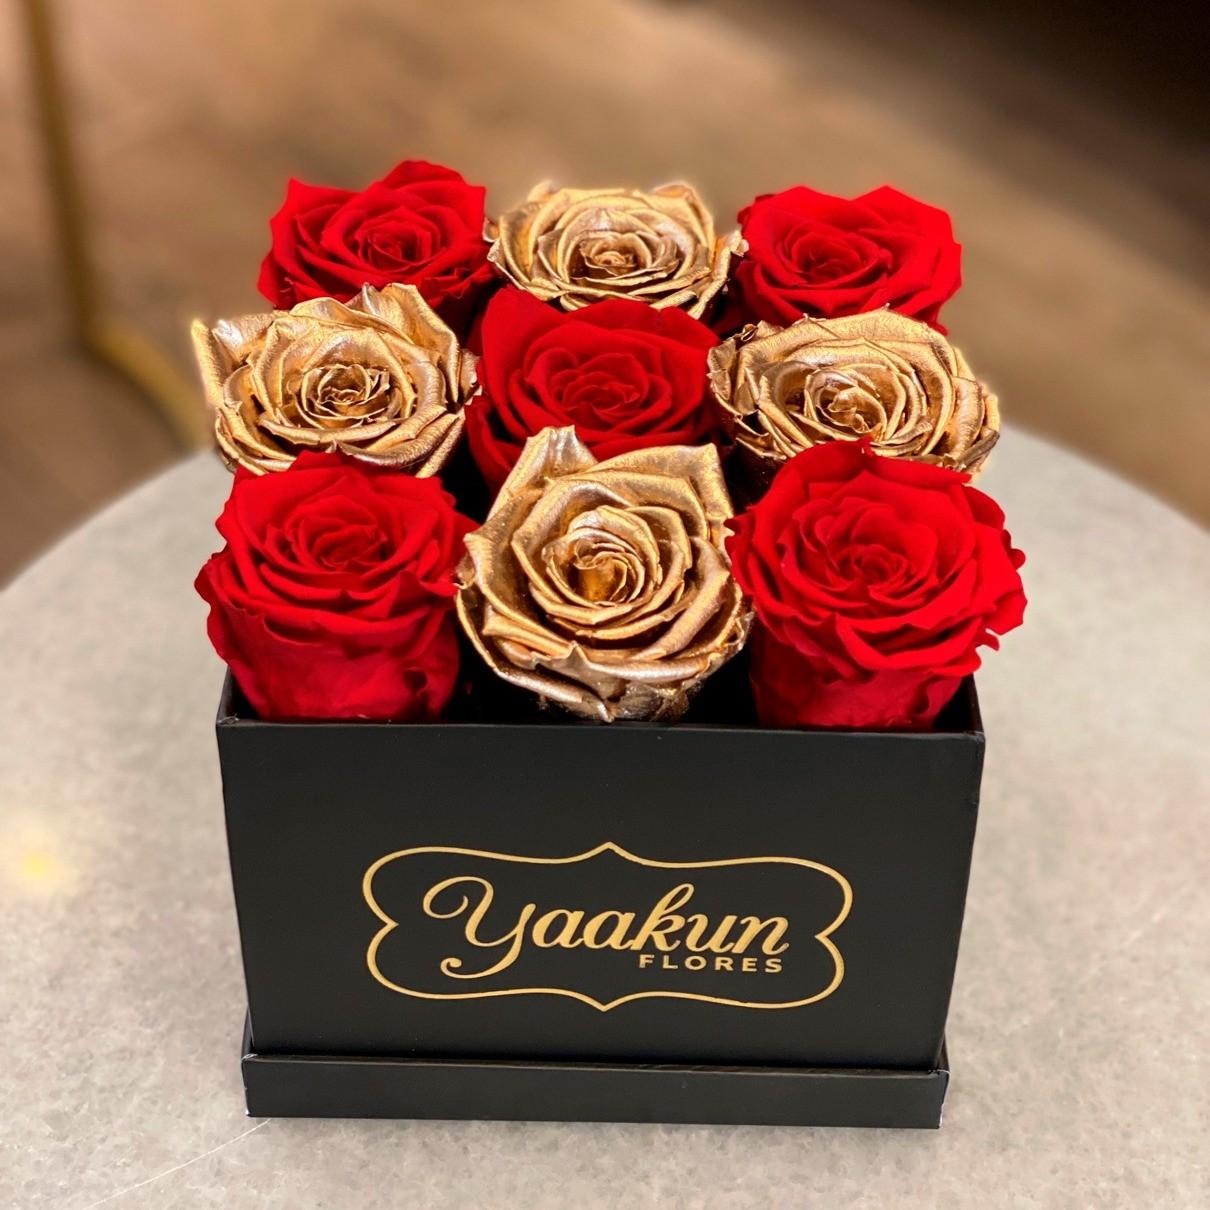 Rosas eternas en caja cuadrara chica red & gold